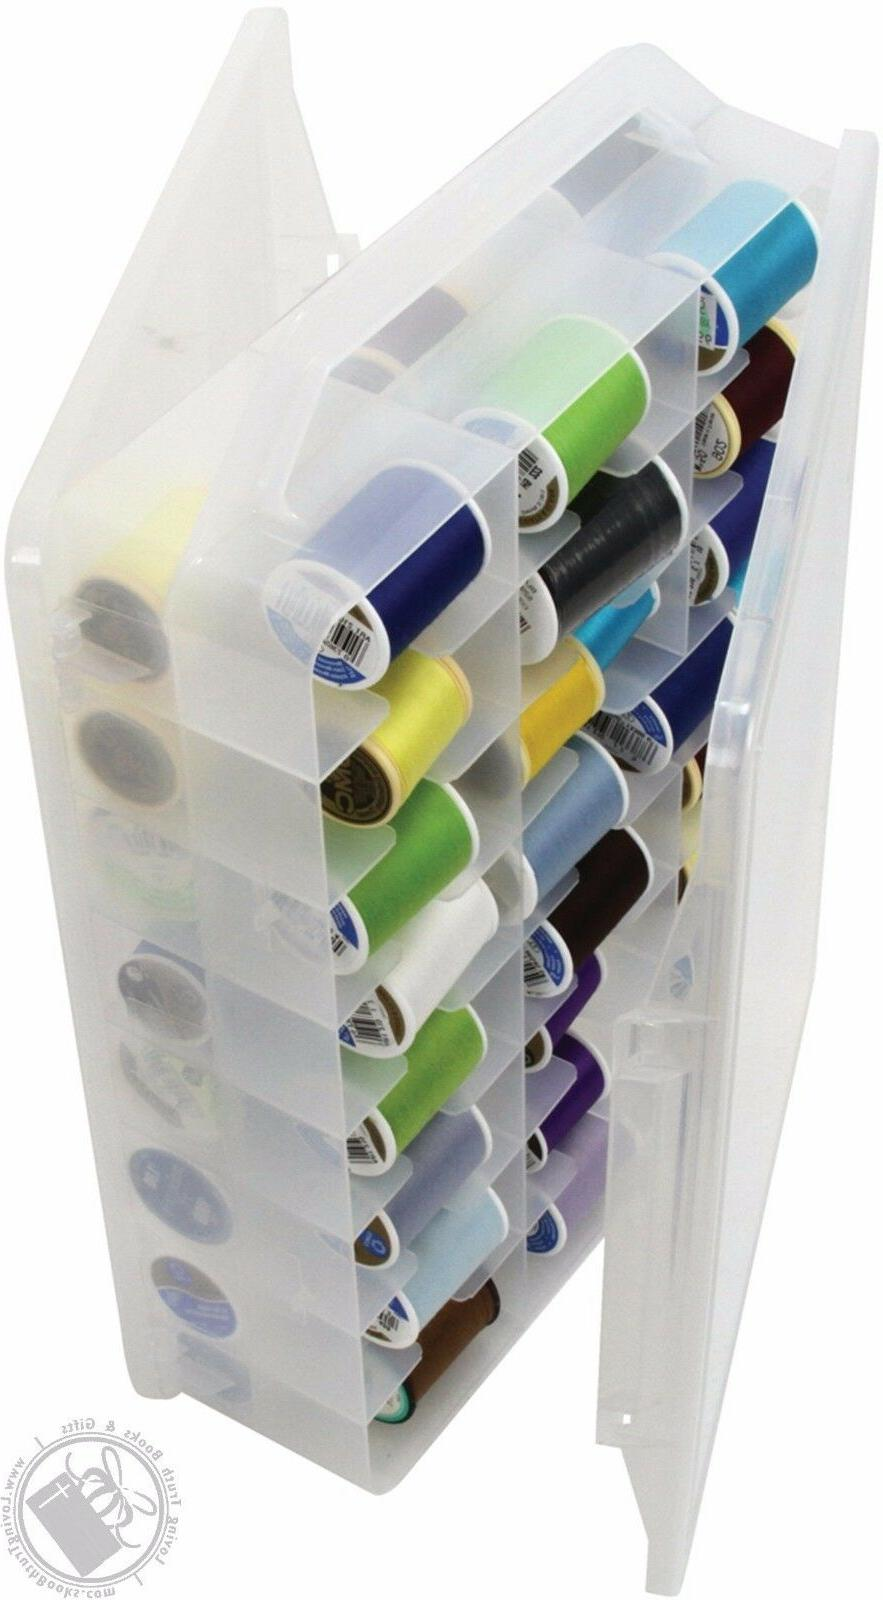 Drawer Matchbox Storage Case 48 Slot Bead Crafts Jewels Orga